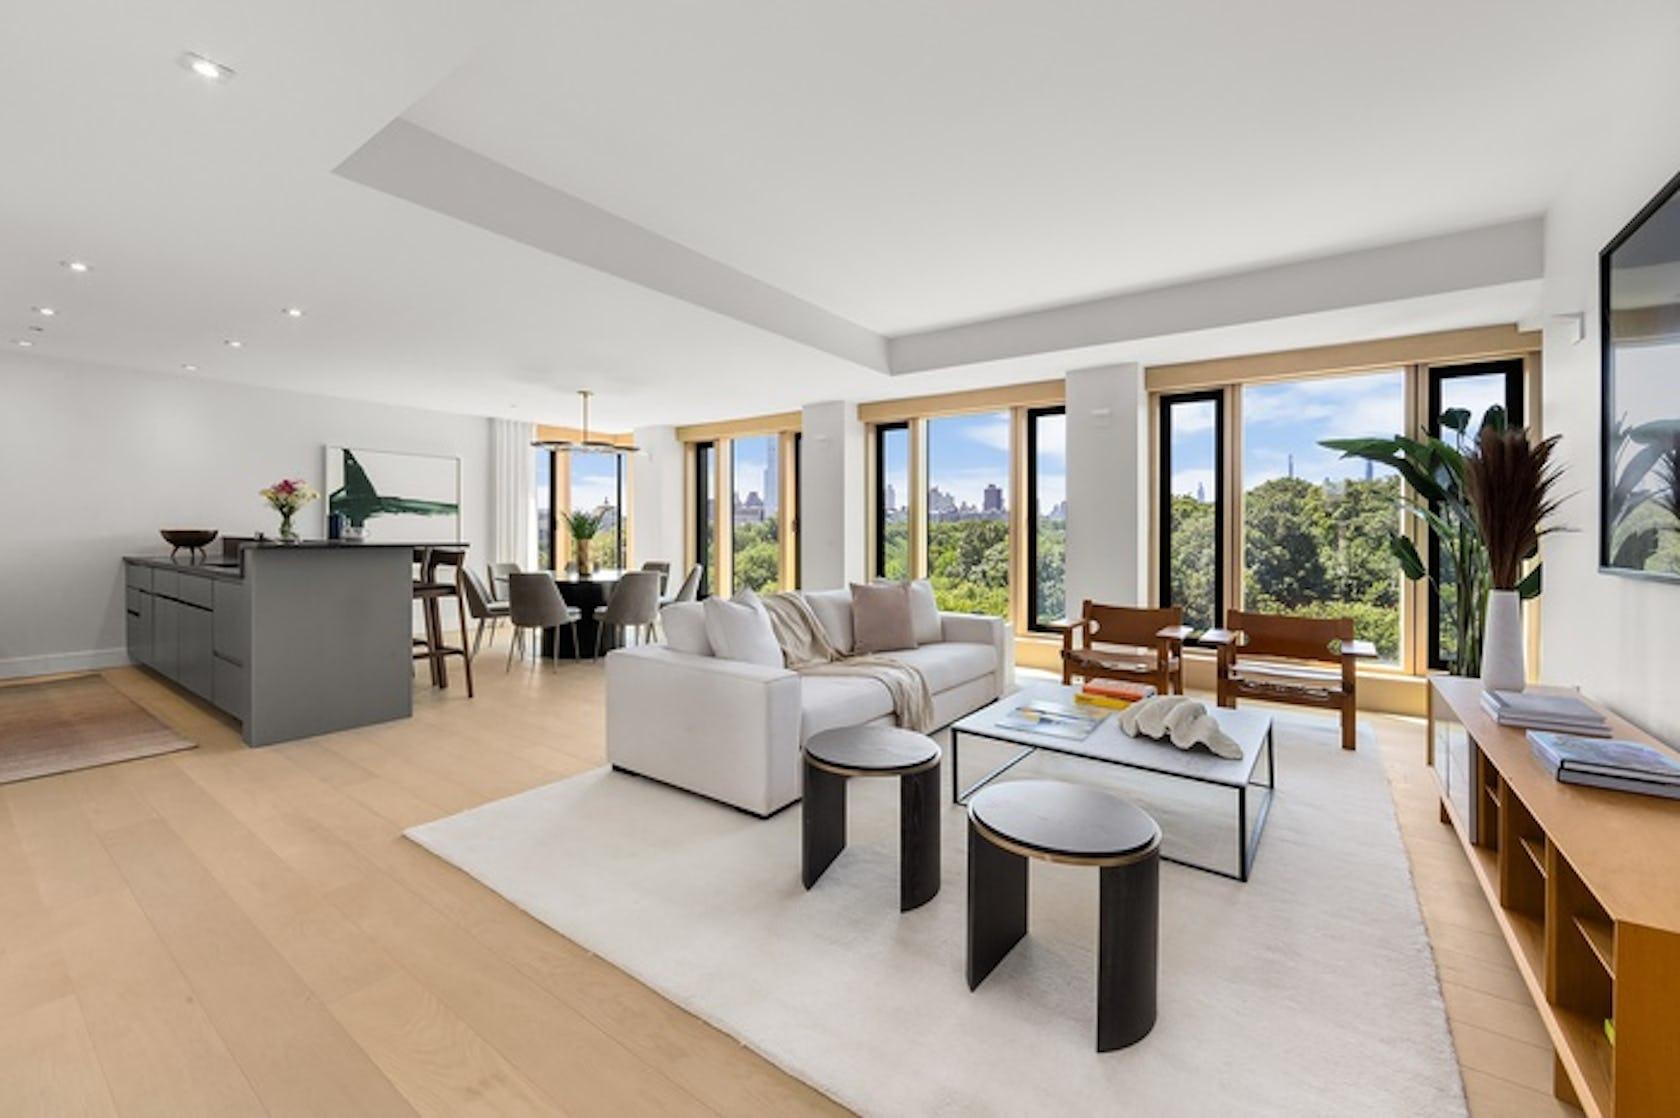 furniture indoors housing building interior design living room room table flooring coffee table